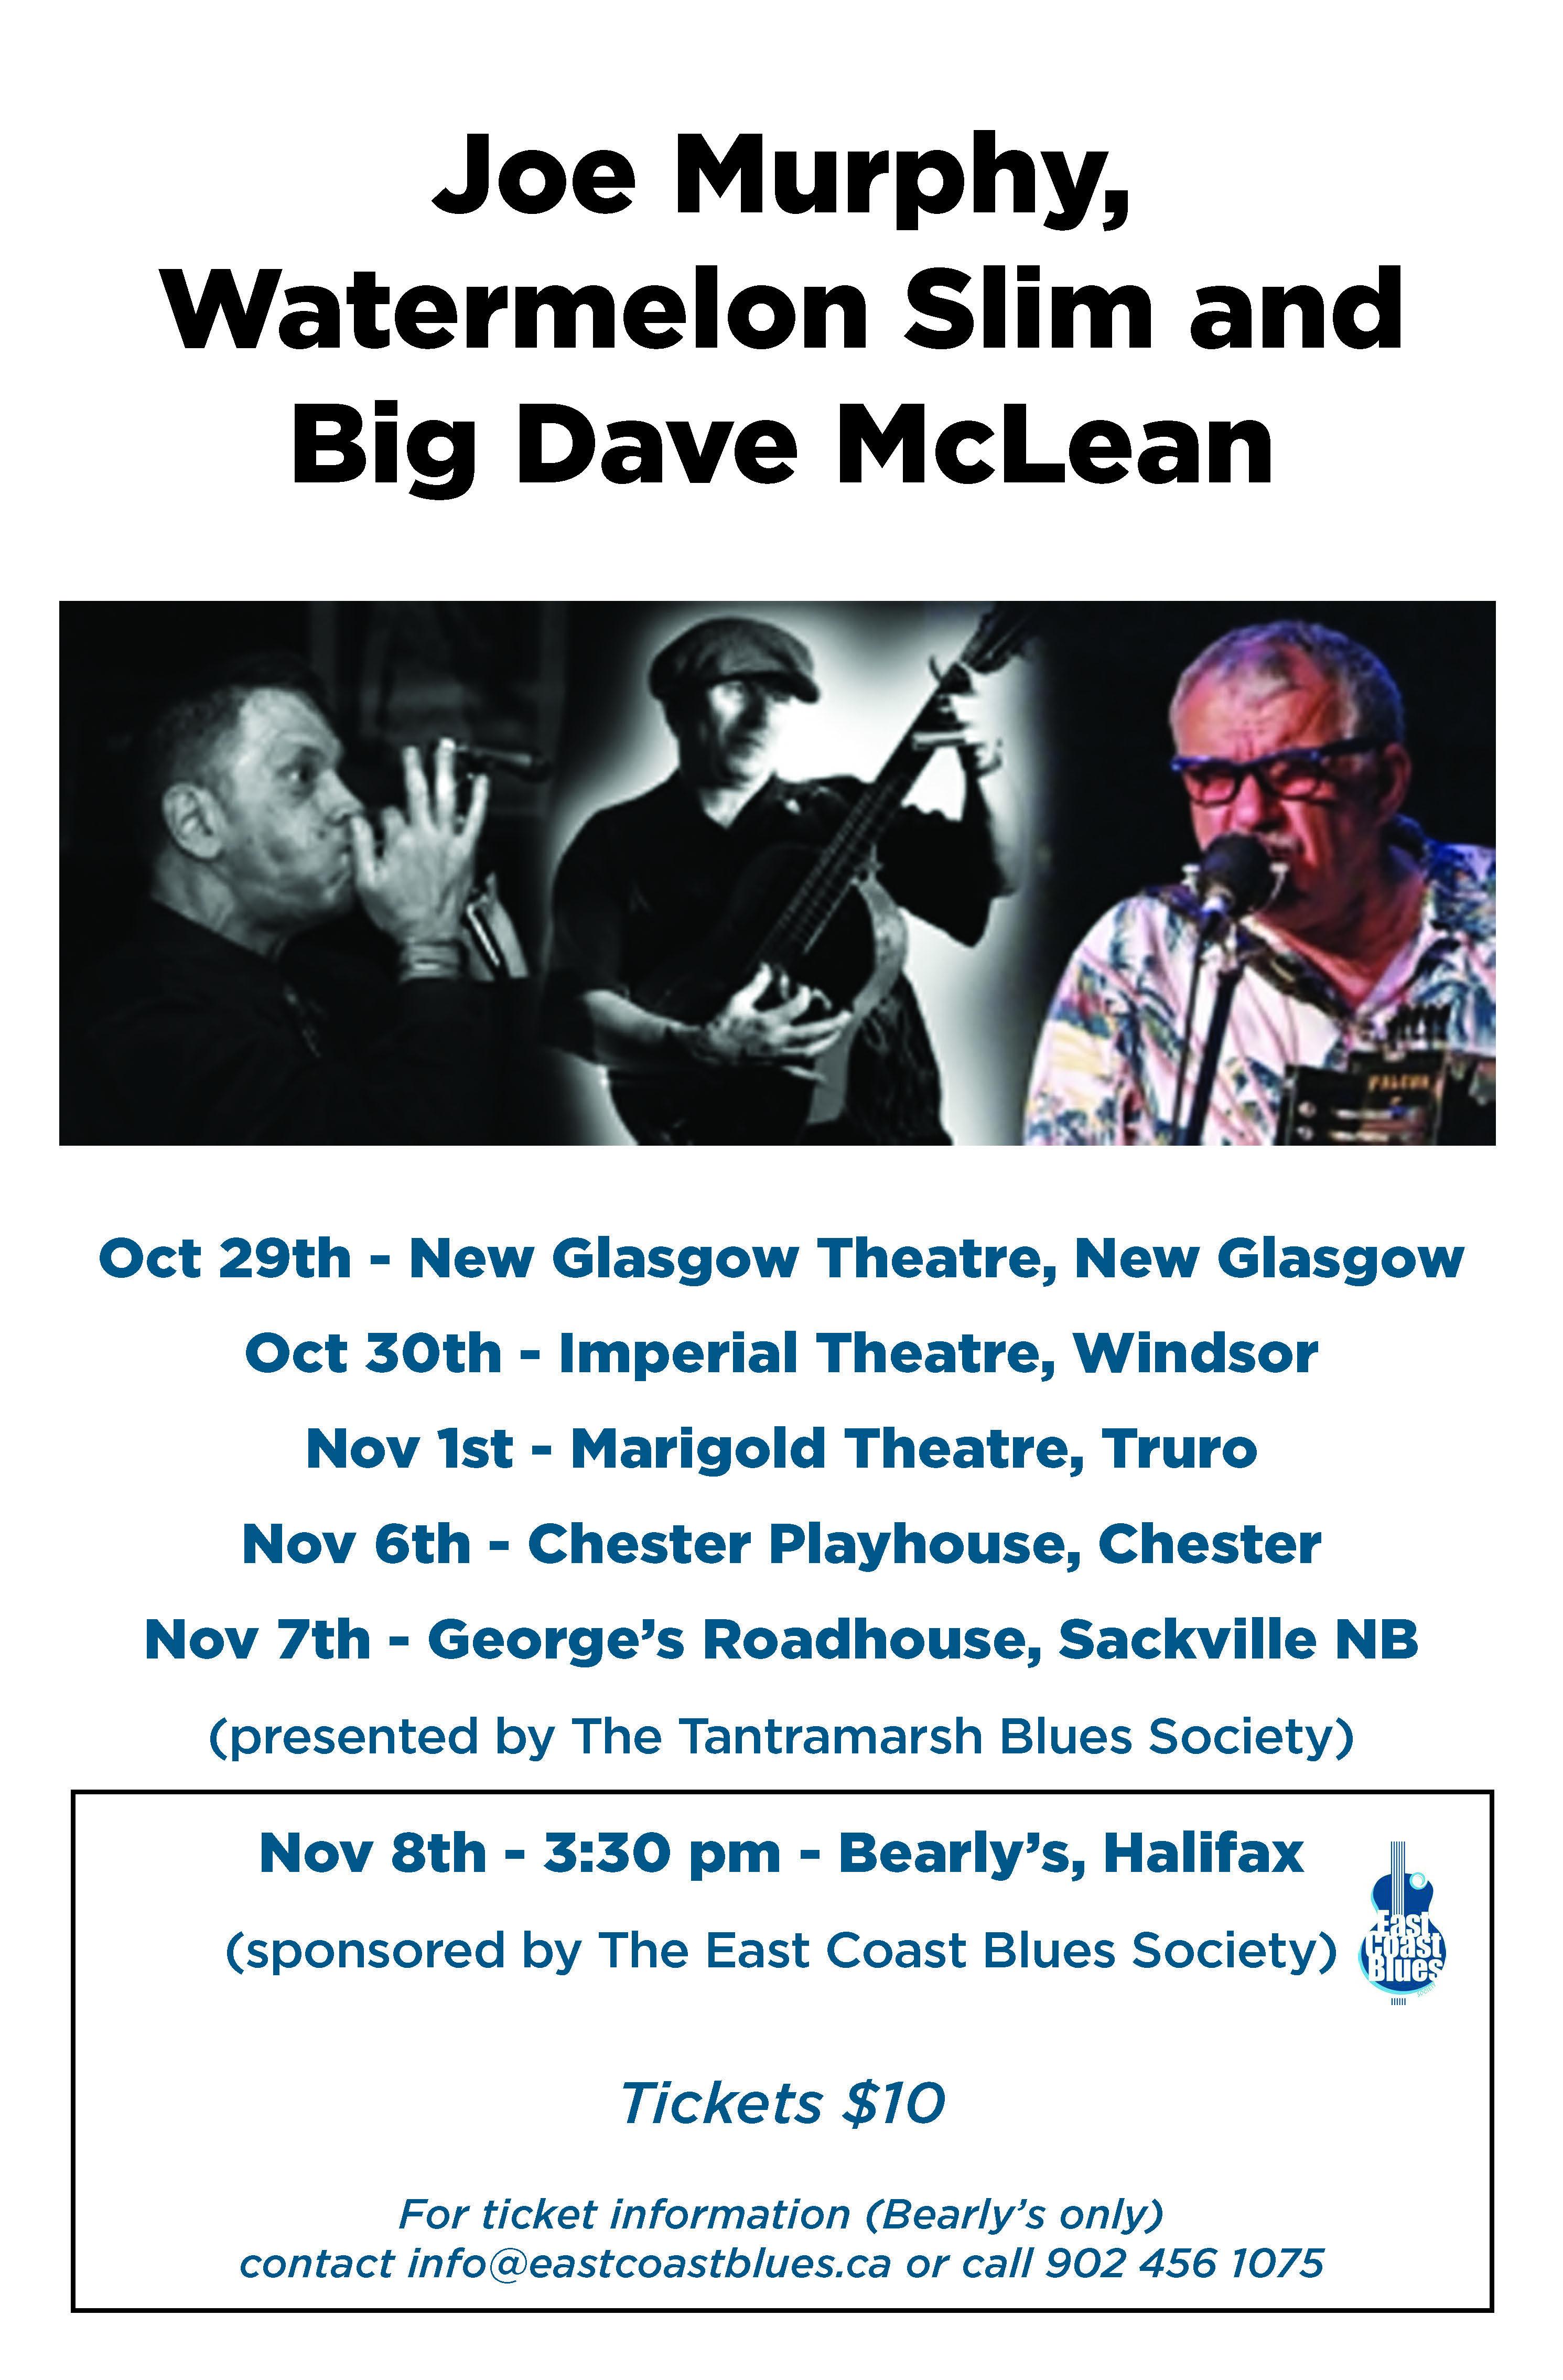 Joe Murphy, Big Dave McLean, and Watermelon Slim tour dates